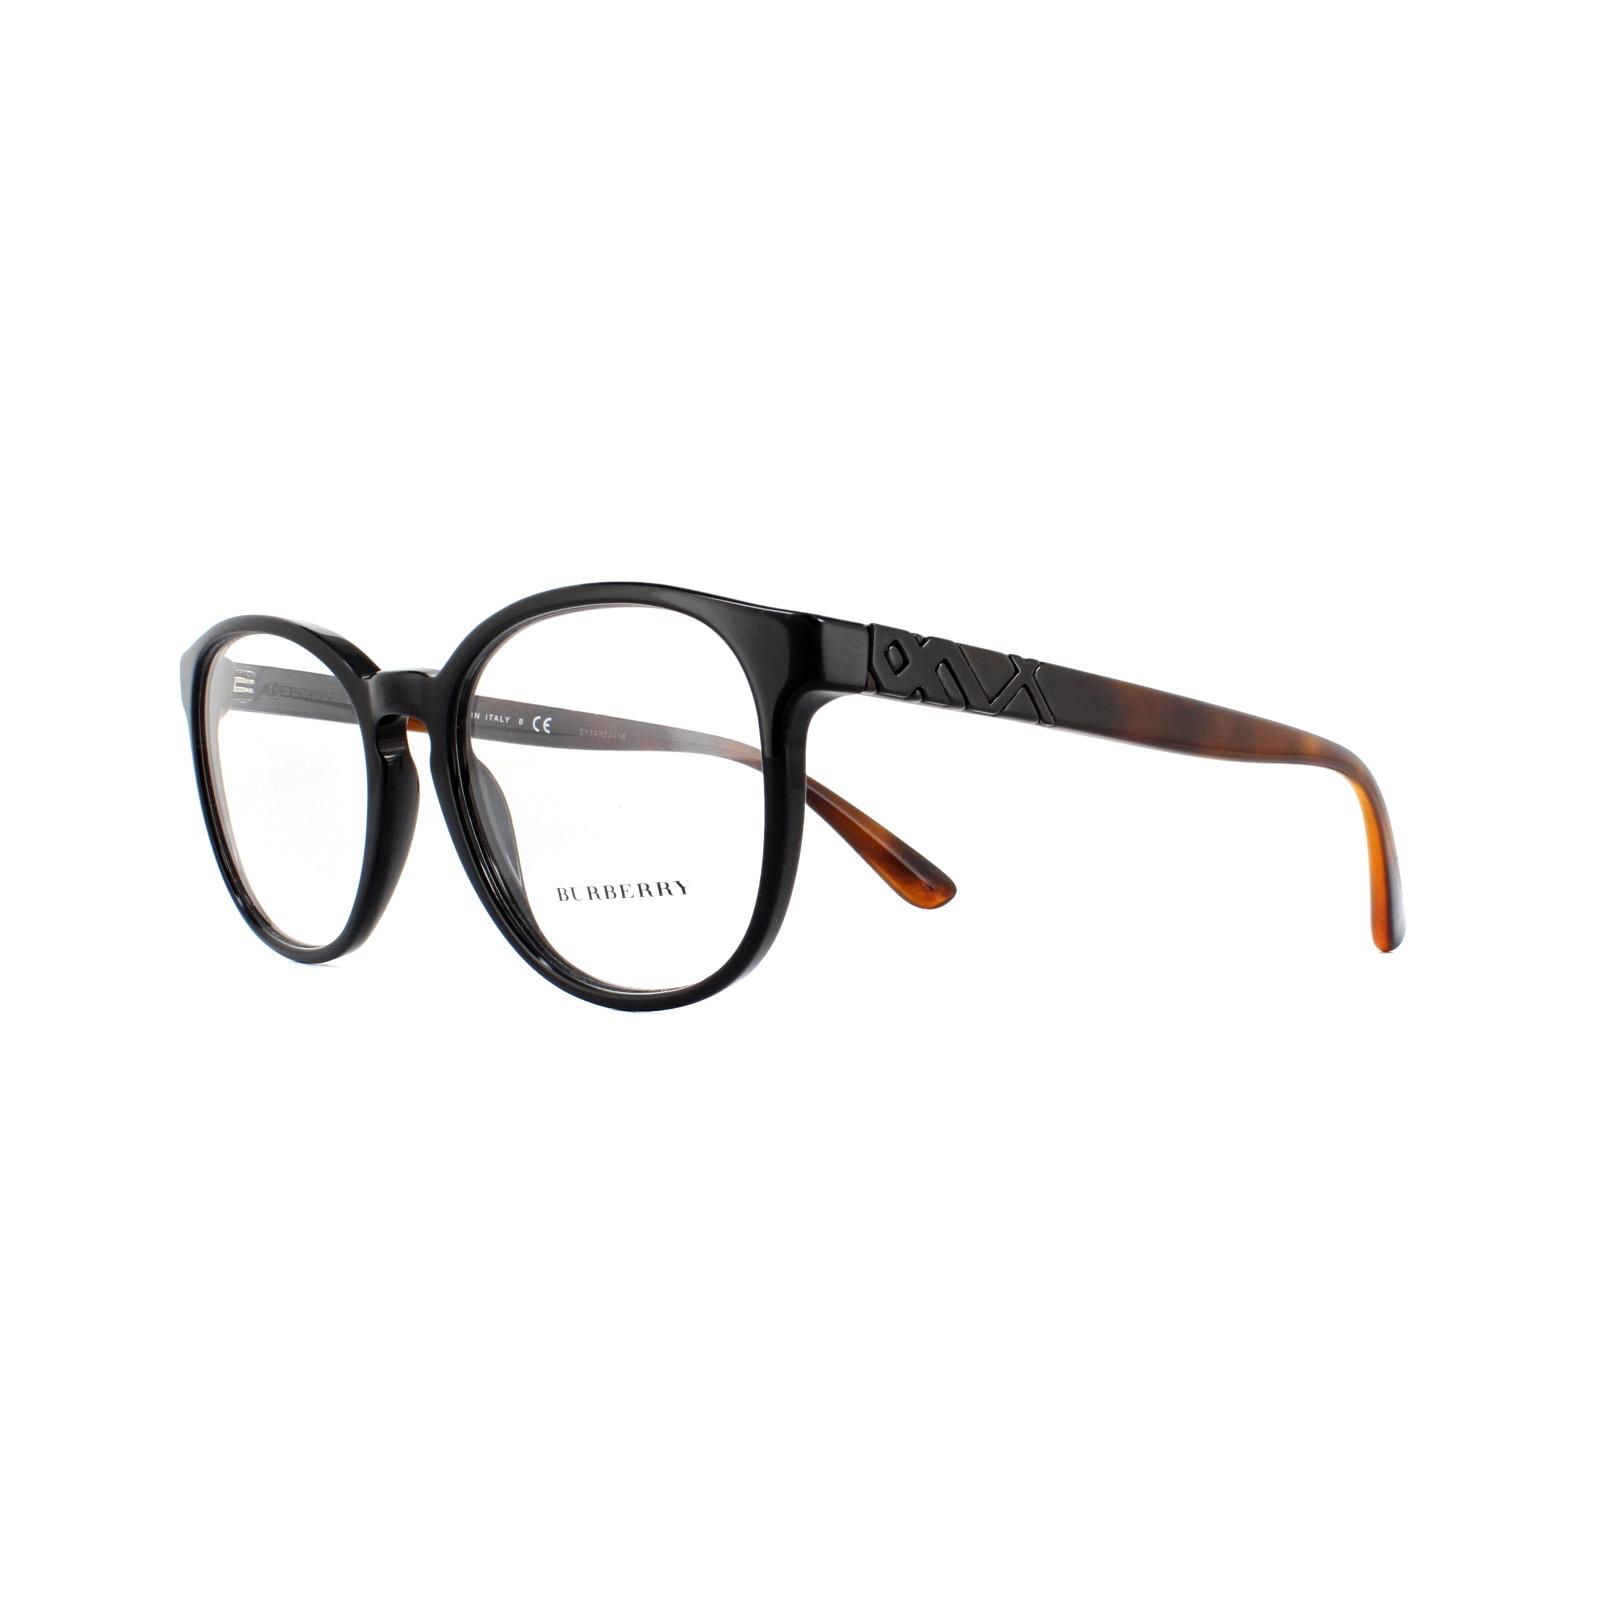 94fd8482d9e Sentinel Burberry Glasses Frames BE 2241 3001 Black 52mm Womens